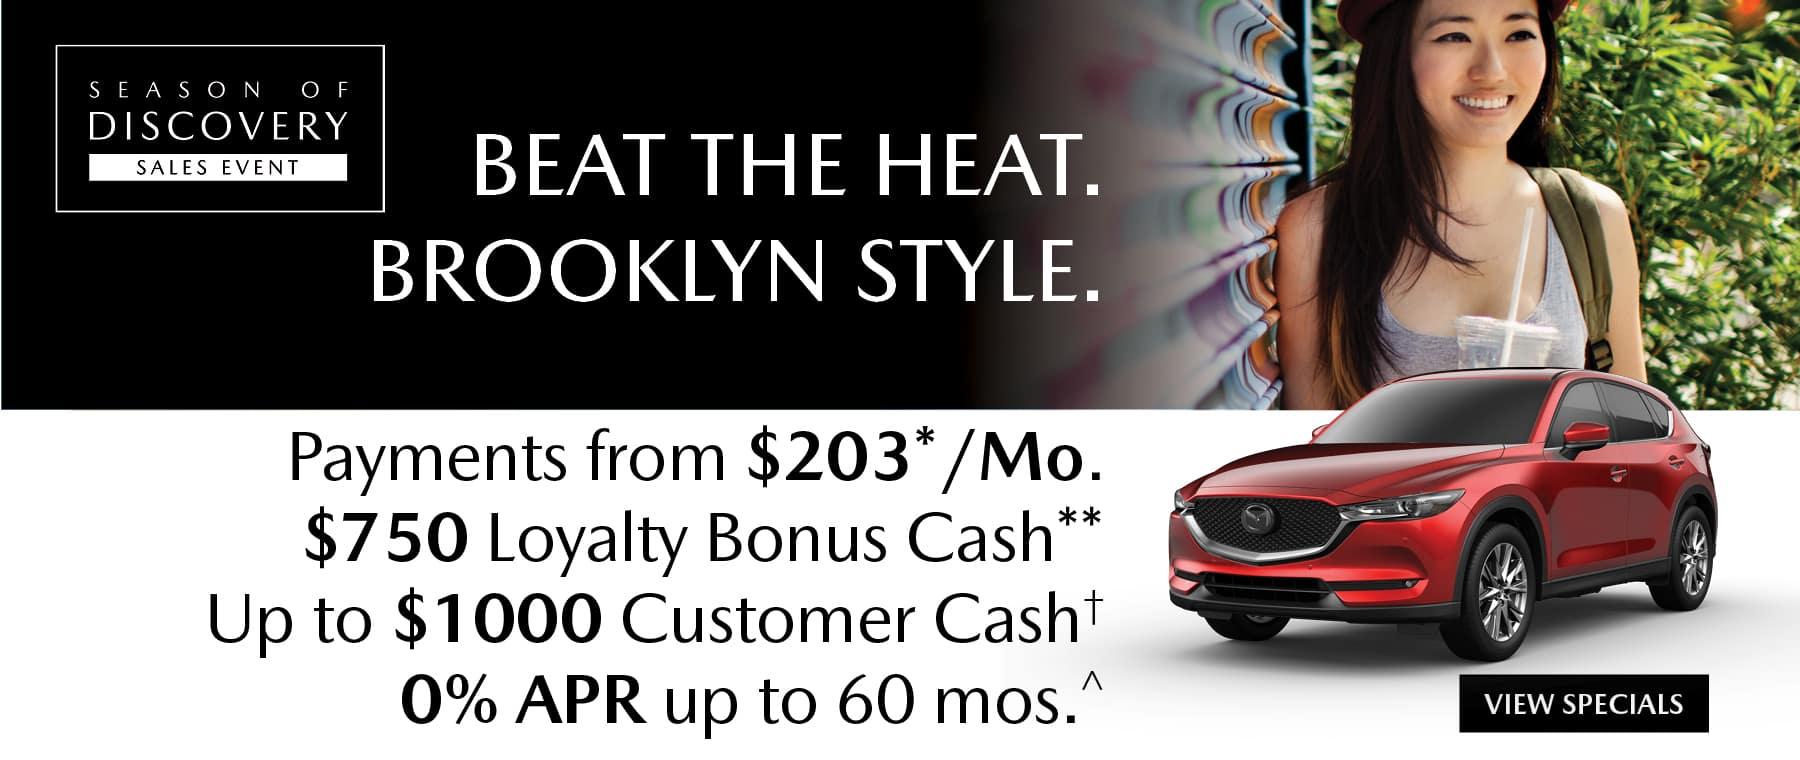 BRMA-1491 Beat Heat 1800x760_Generic